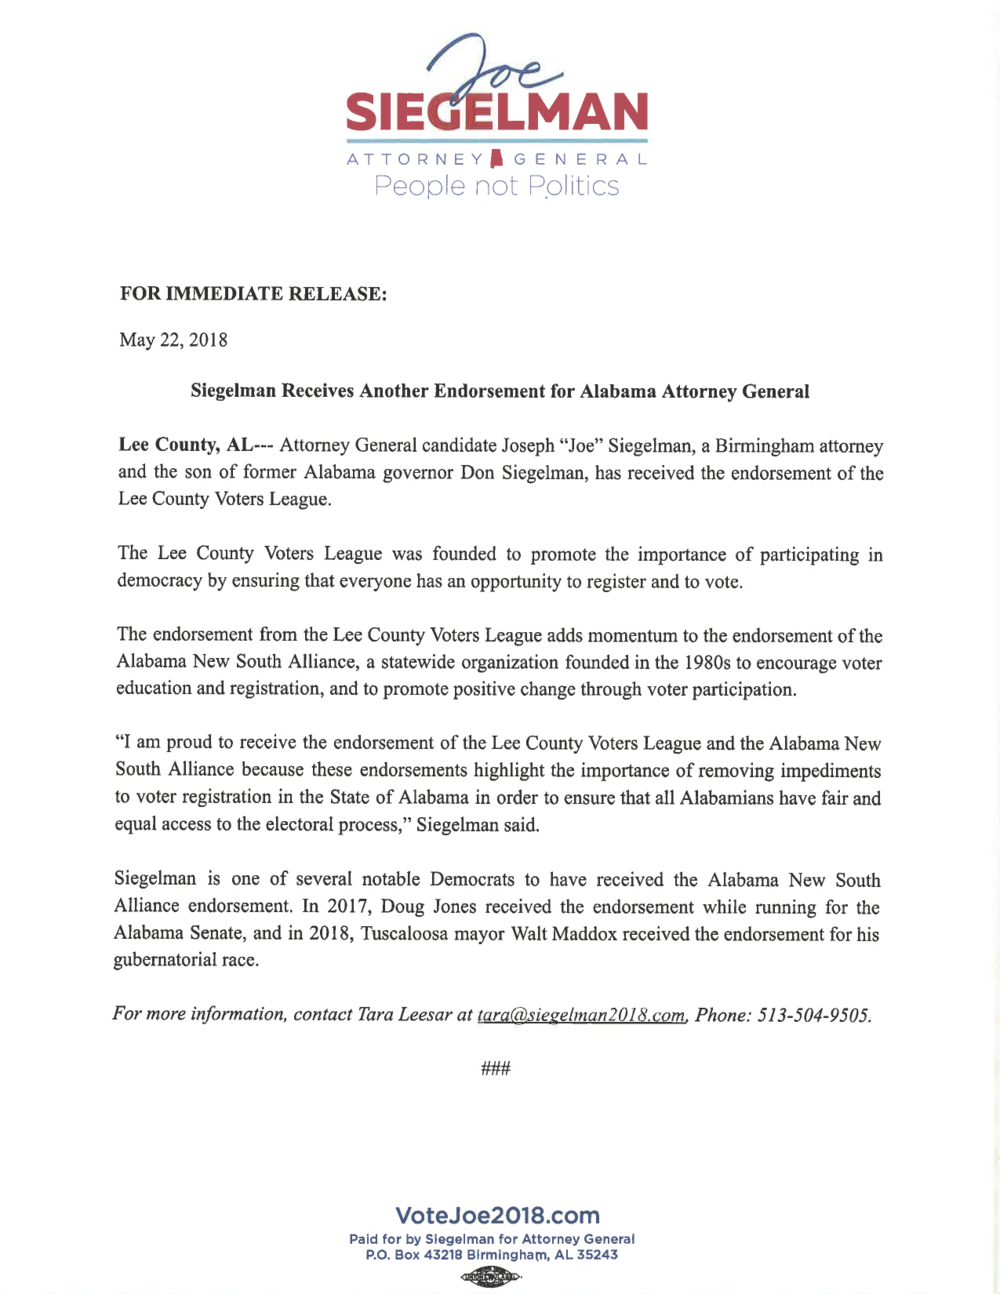 Siegelman Lee County Voters League Endoresement Press Release (2).png